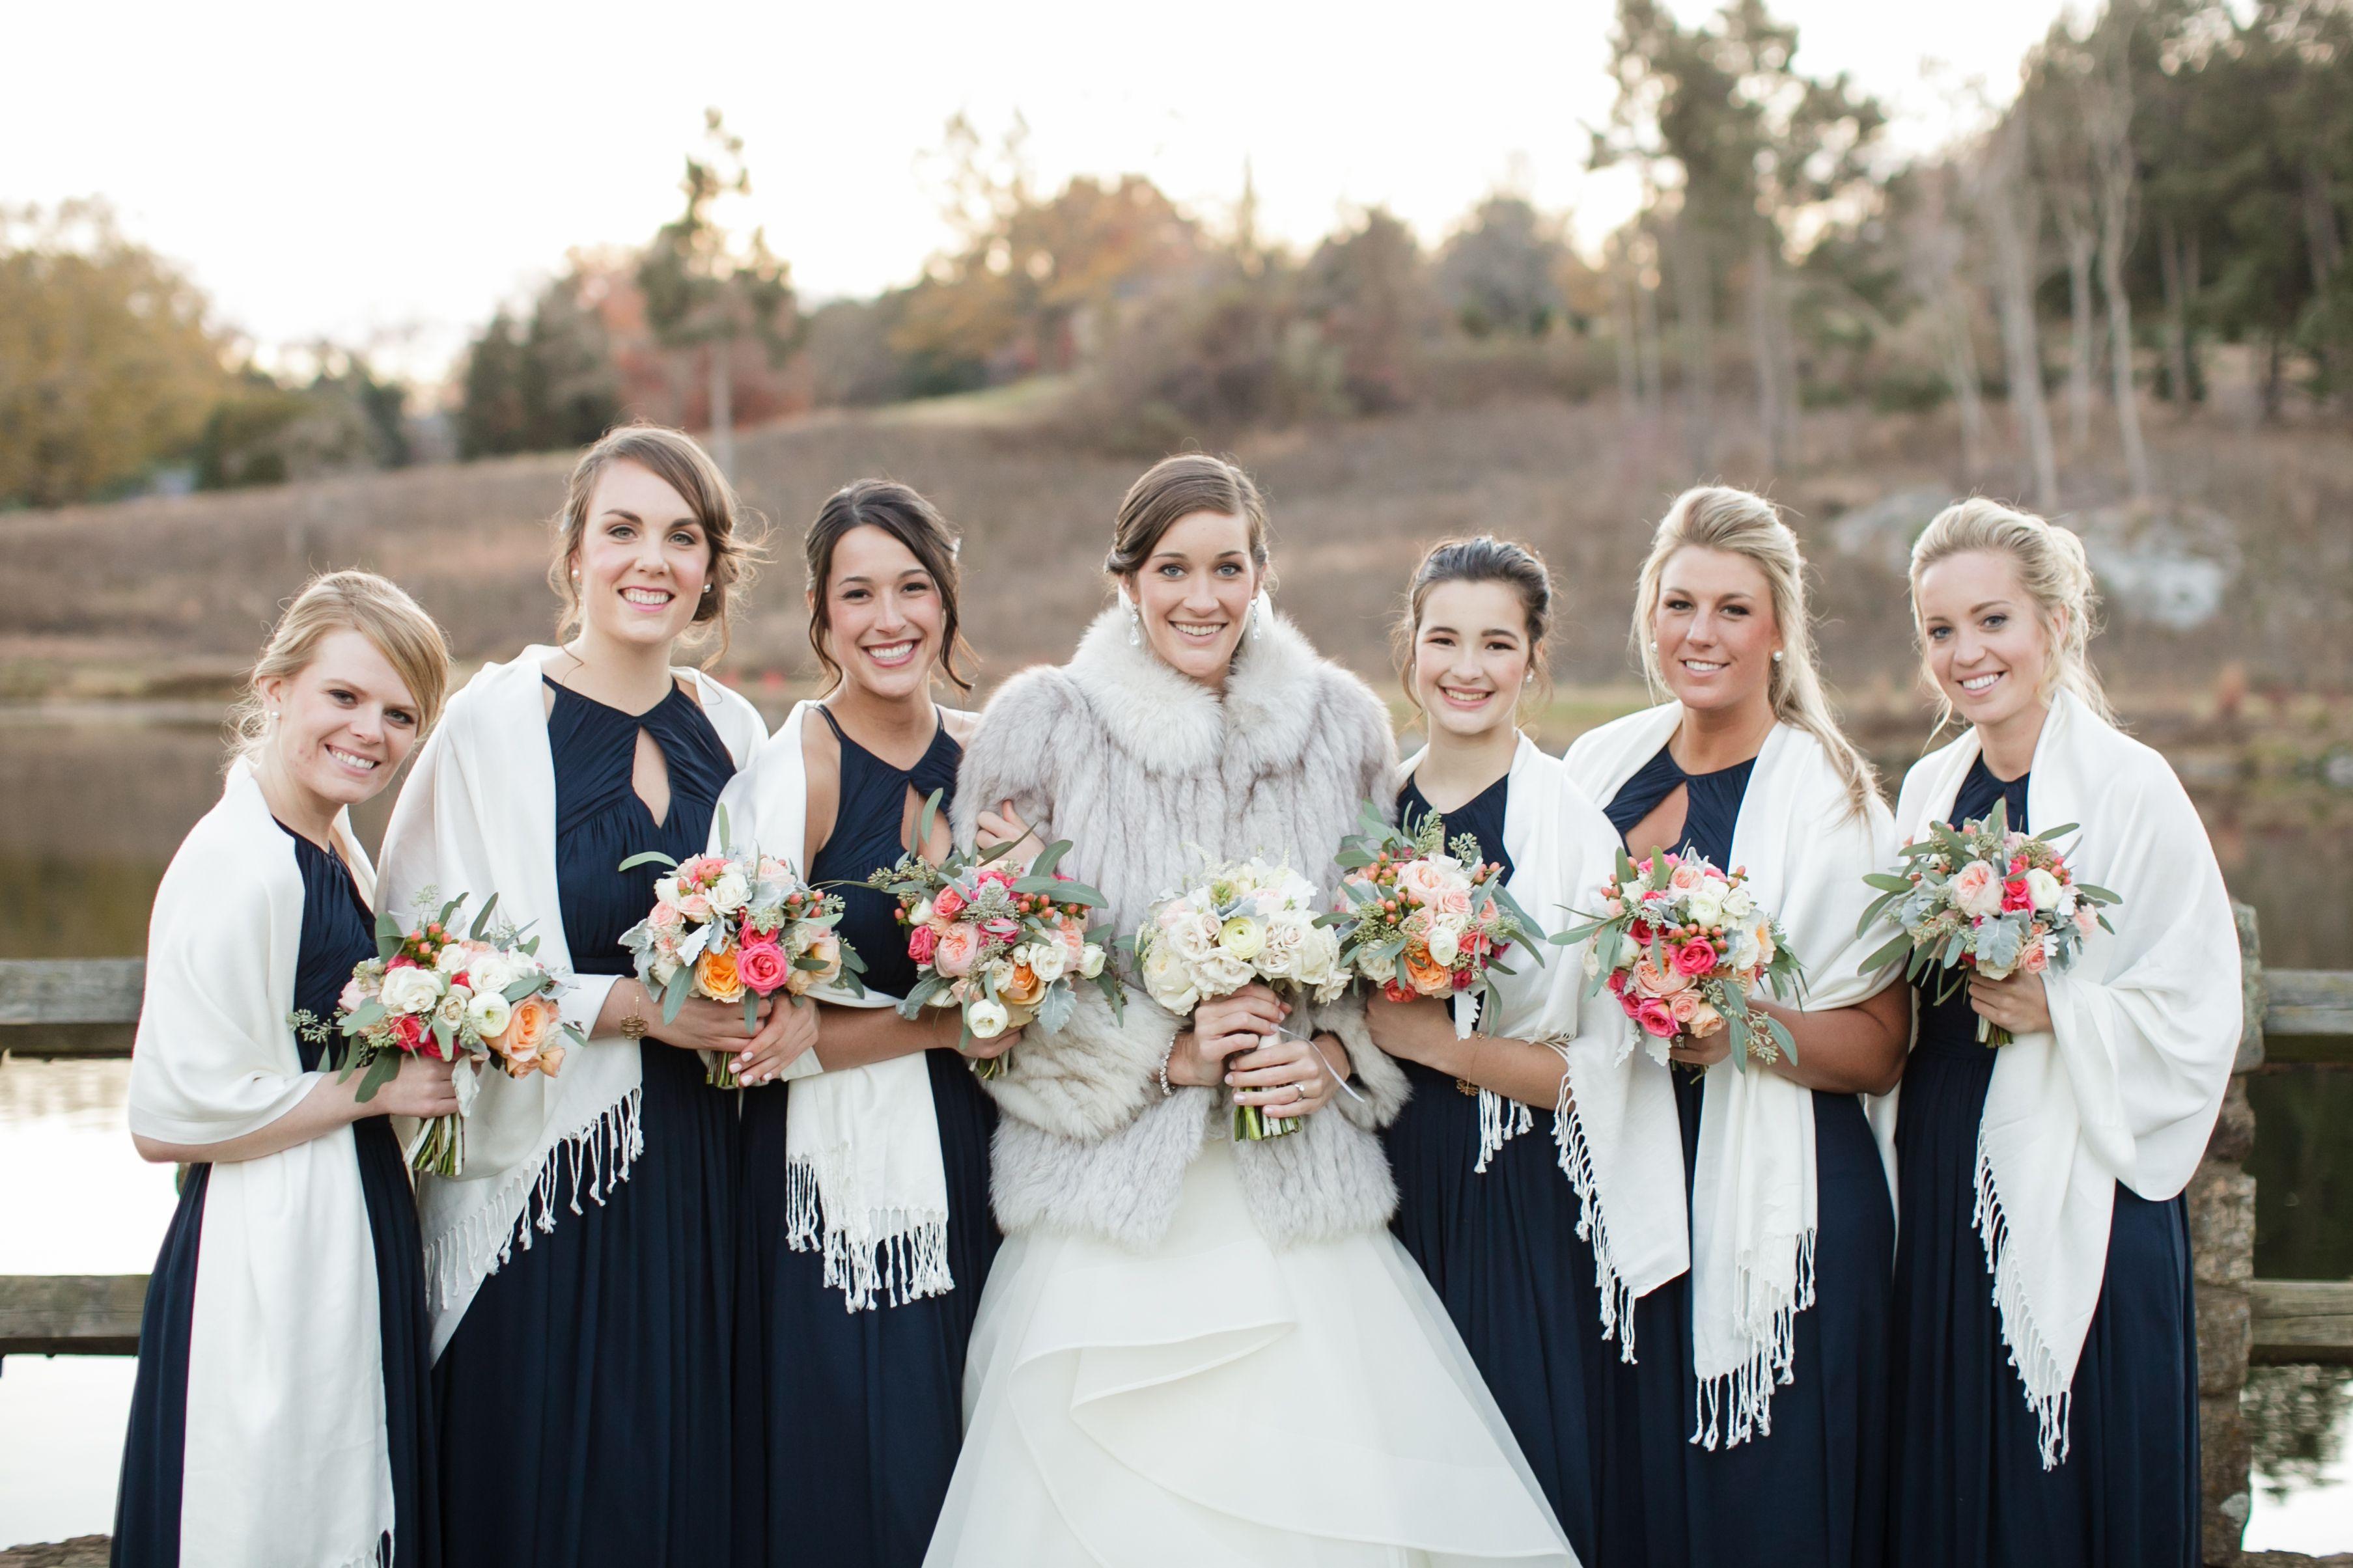 Winter Bridal Party Navy Blue Wedding Uva Chelsea Tyler 11 15 14 Photo Credit Sincerely Liz Photography